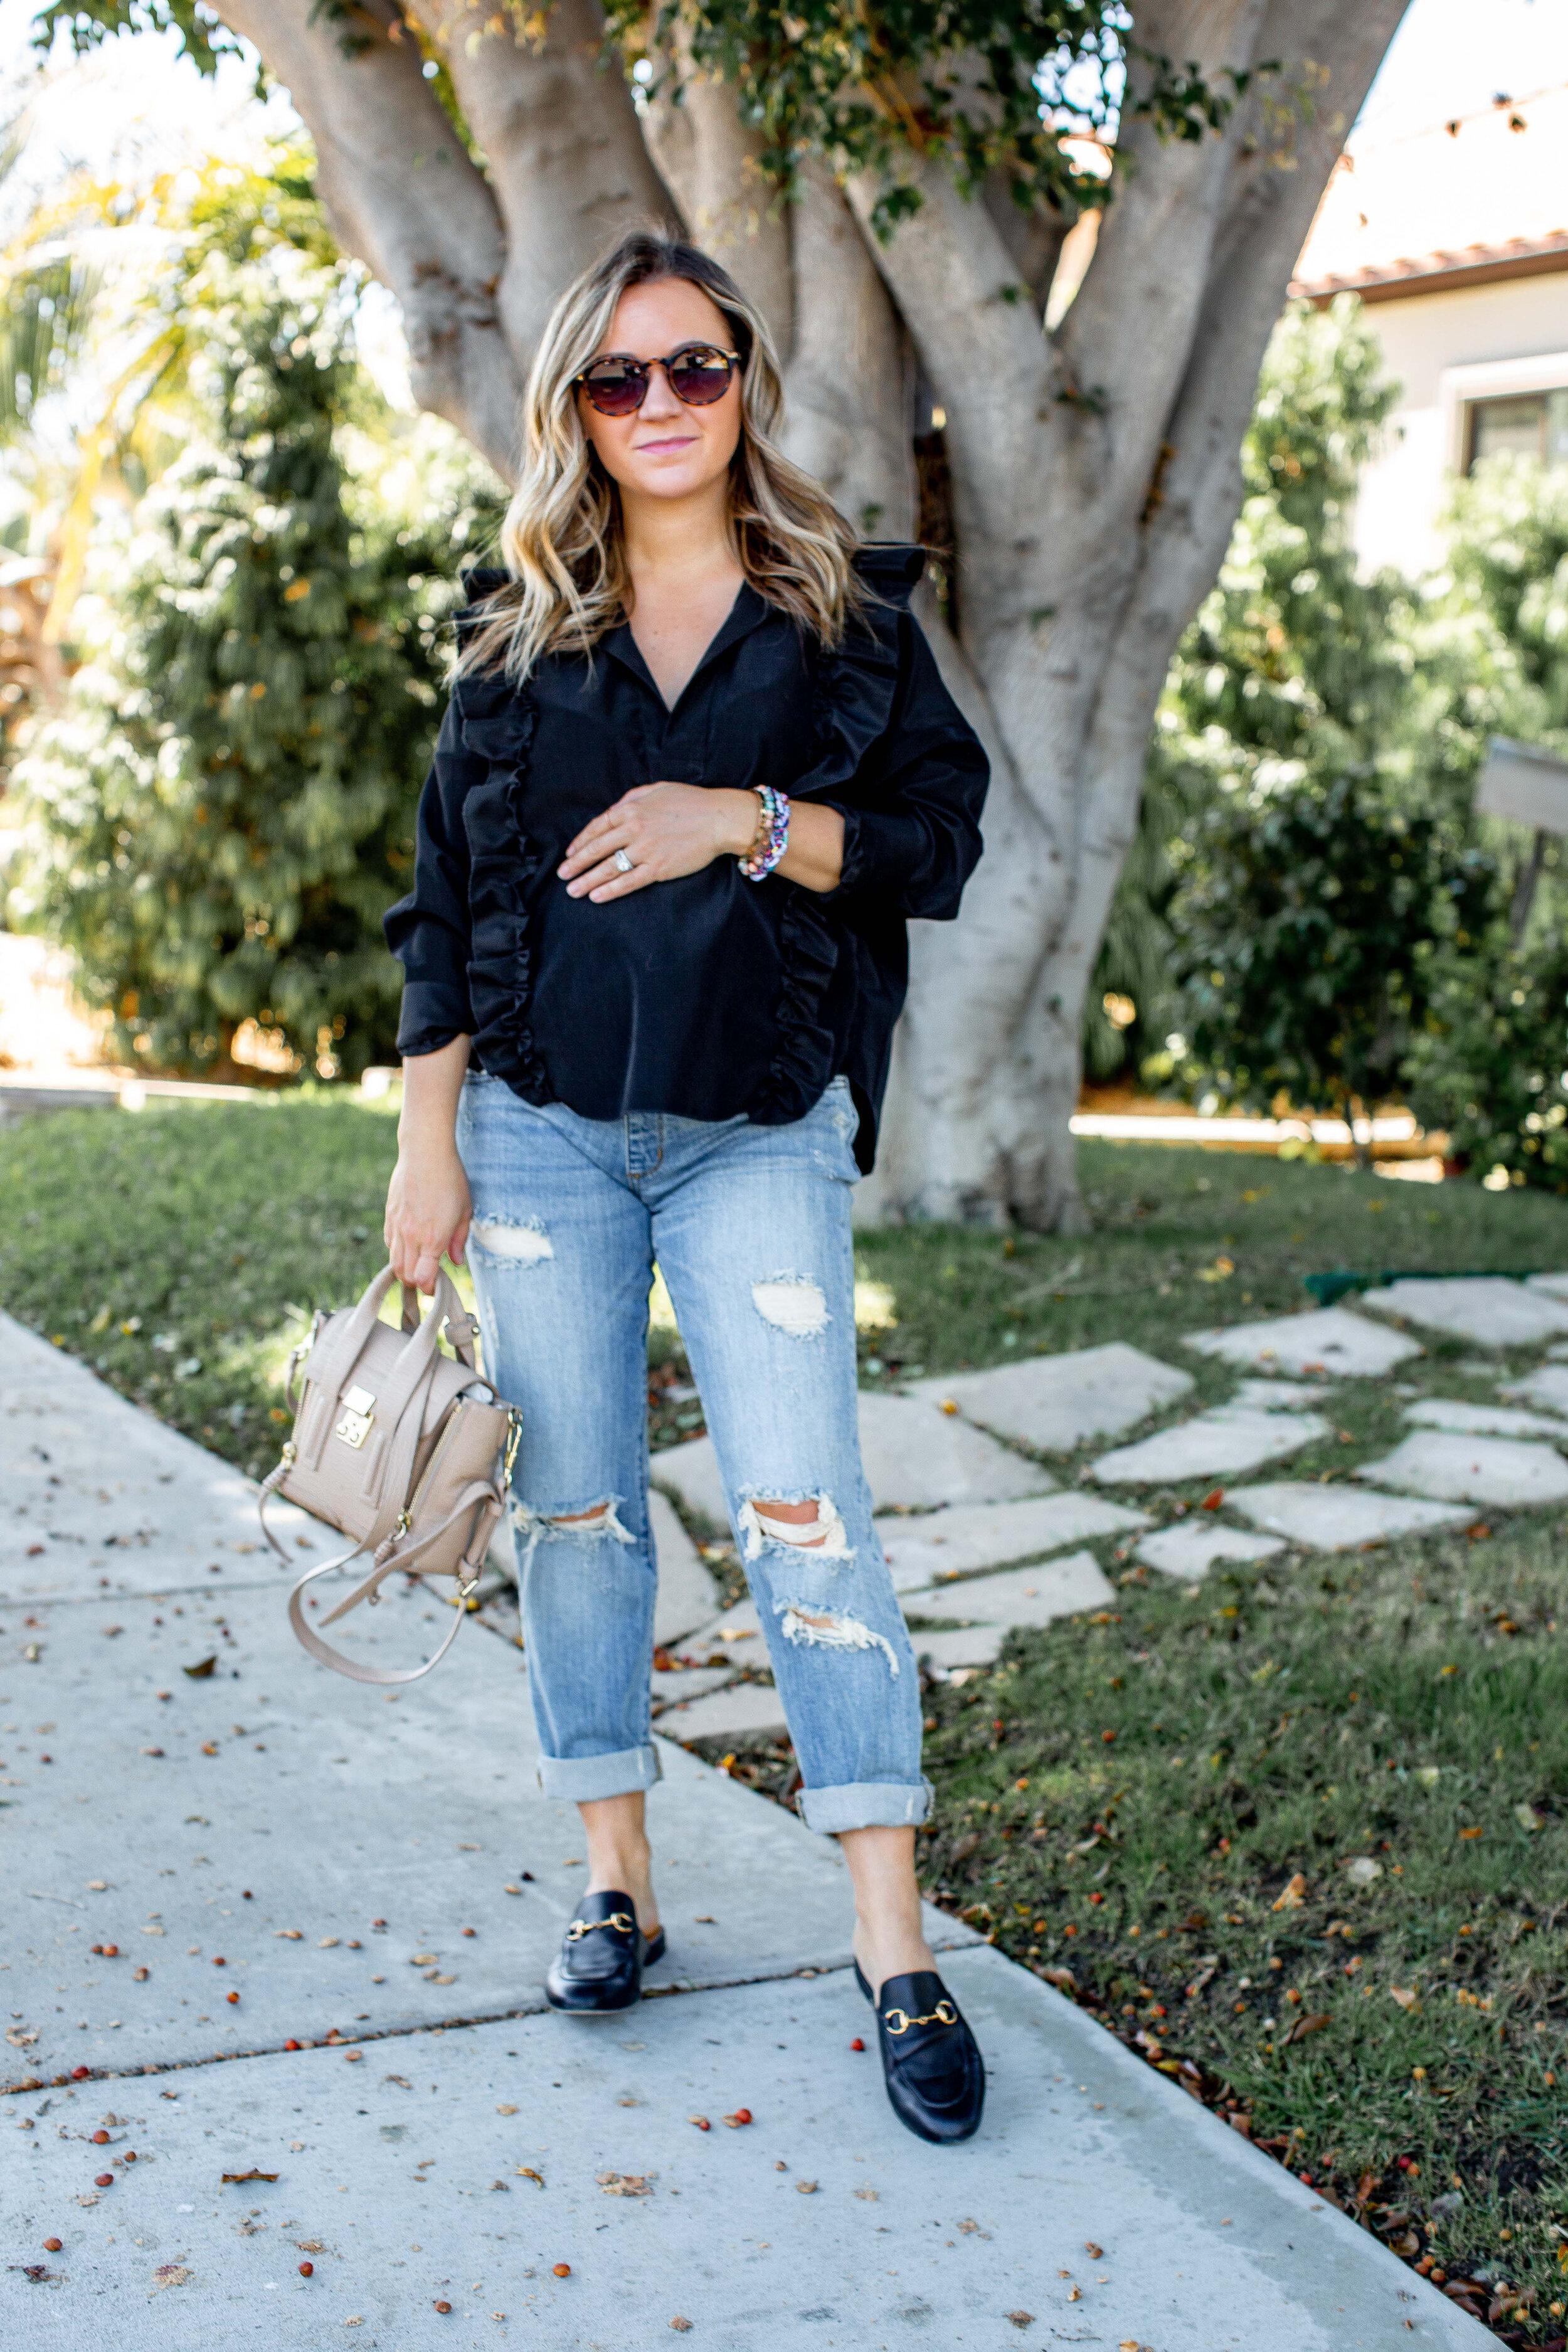 fizz-fade-bf-maternity-jeans-2.jpg